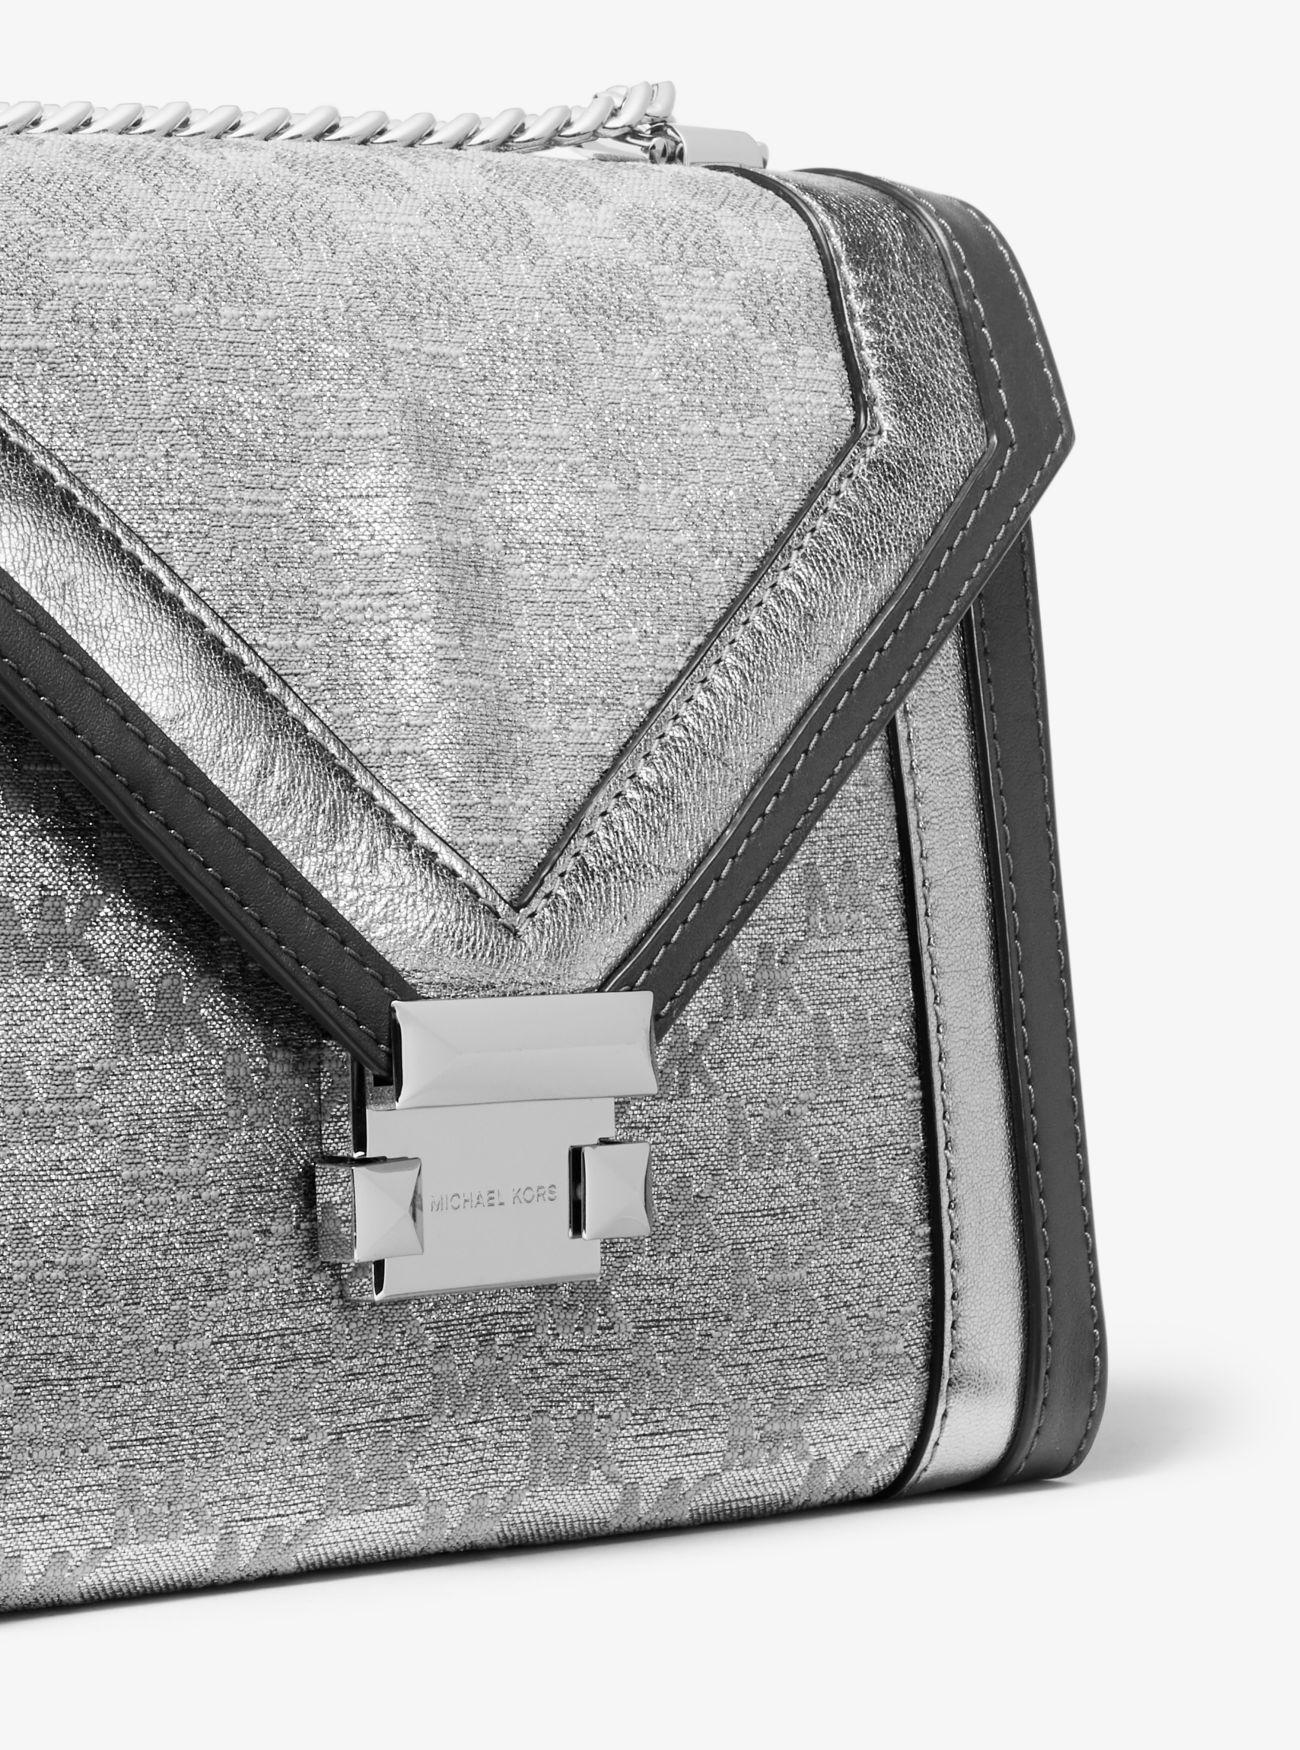 be02b44693e9 Whitney Large Metallic Logo Jacquard Convertible Shoulder Bag ...